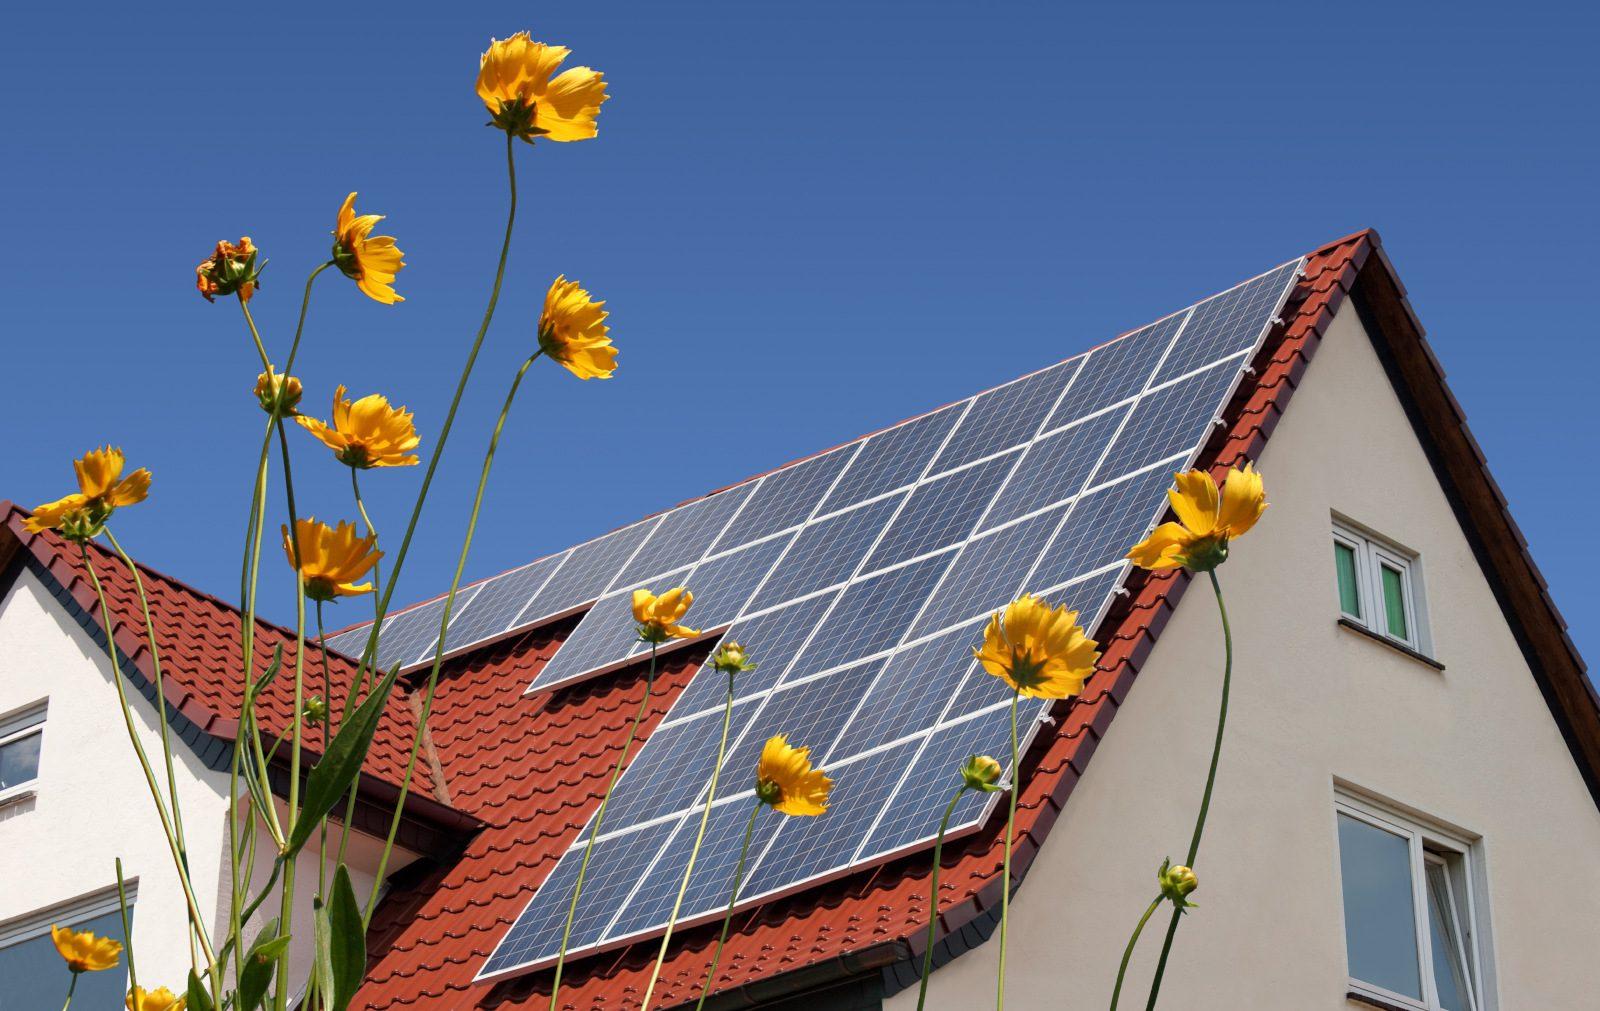 Huis zonnepanelen 1600